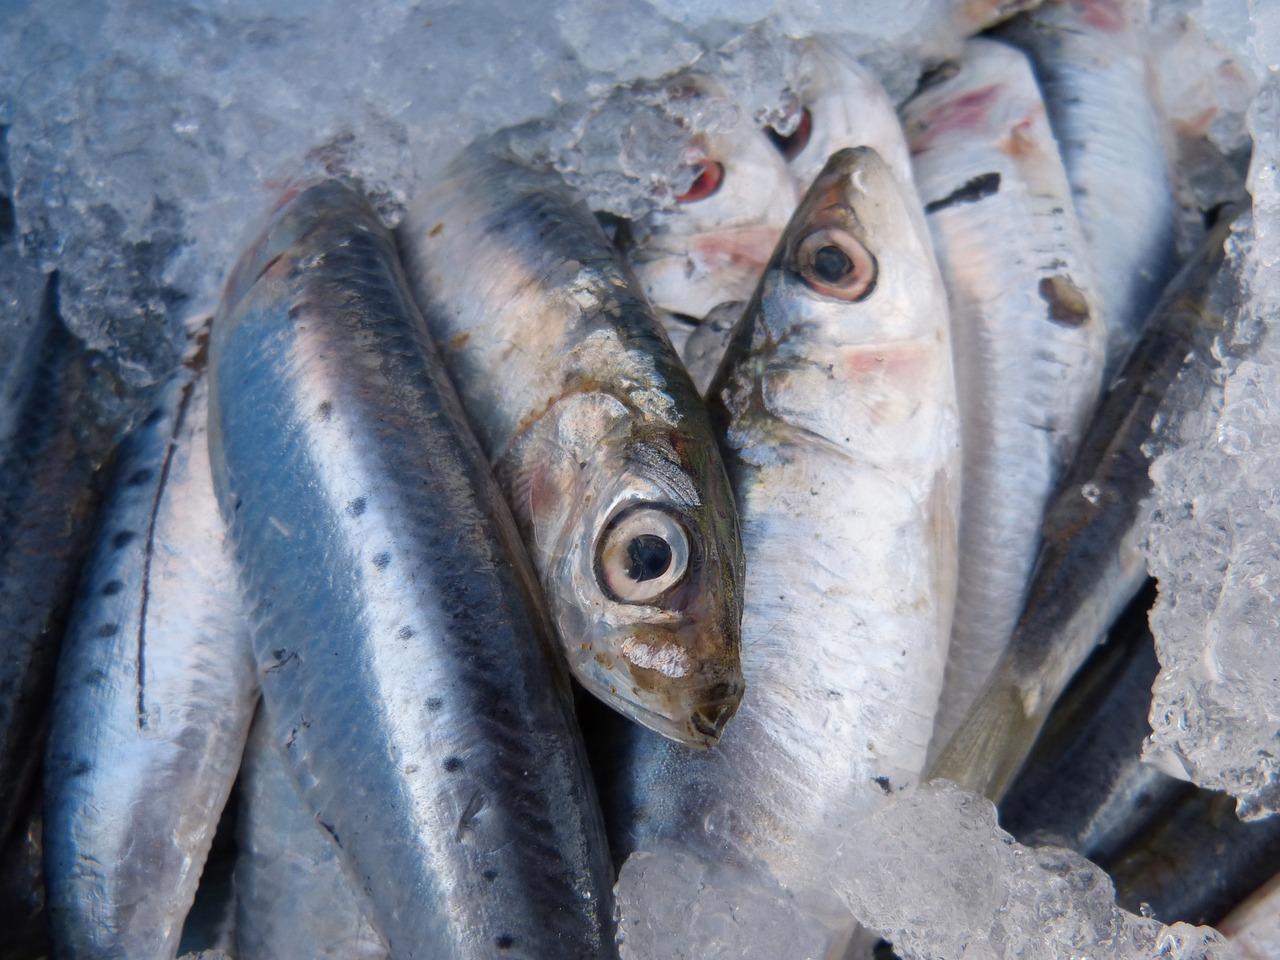 sardines-1106190_1280